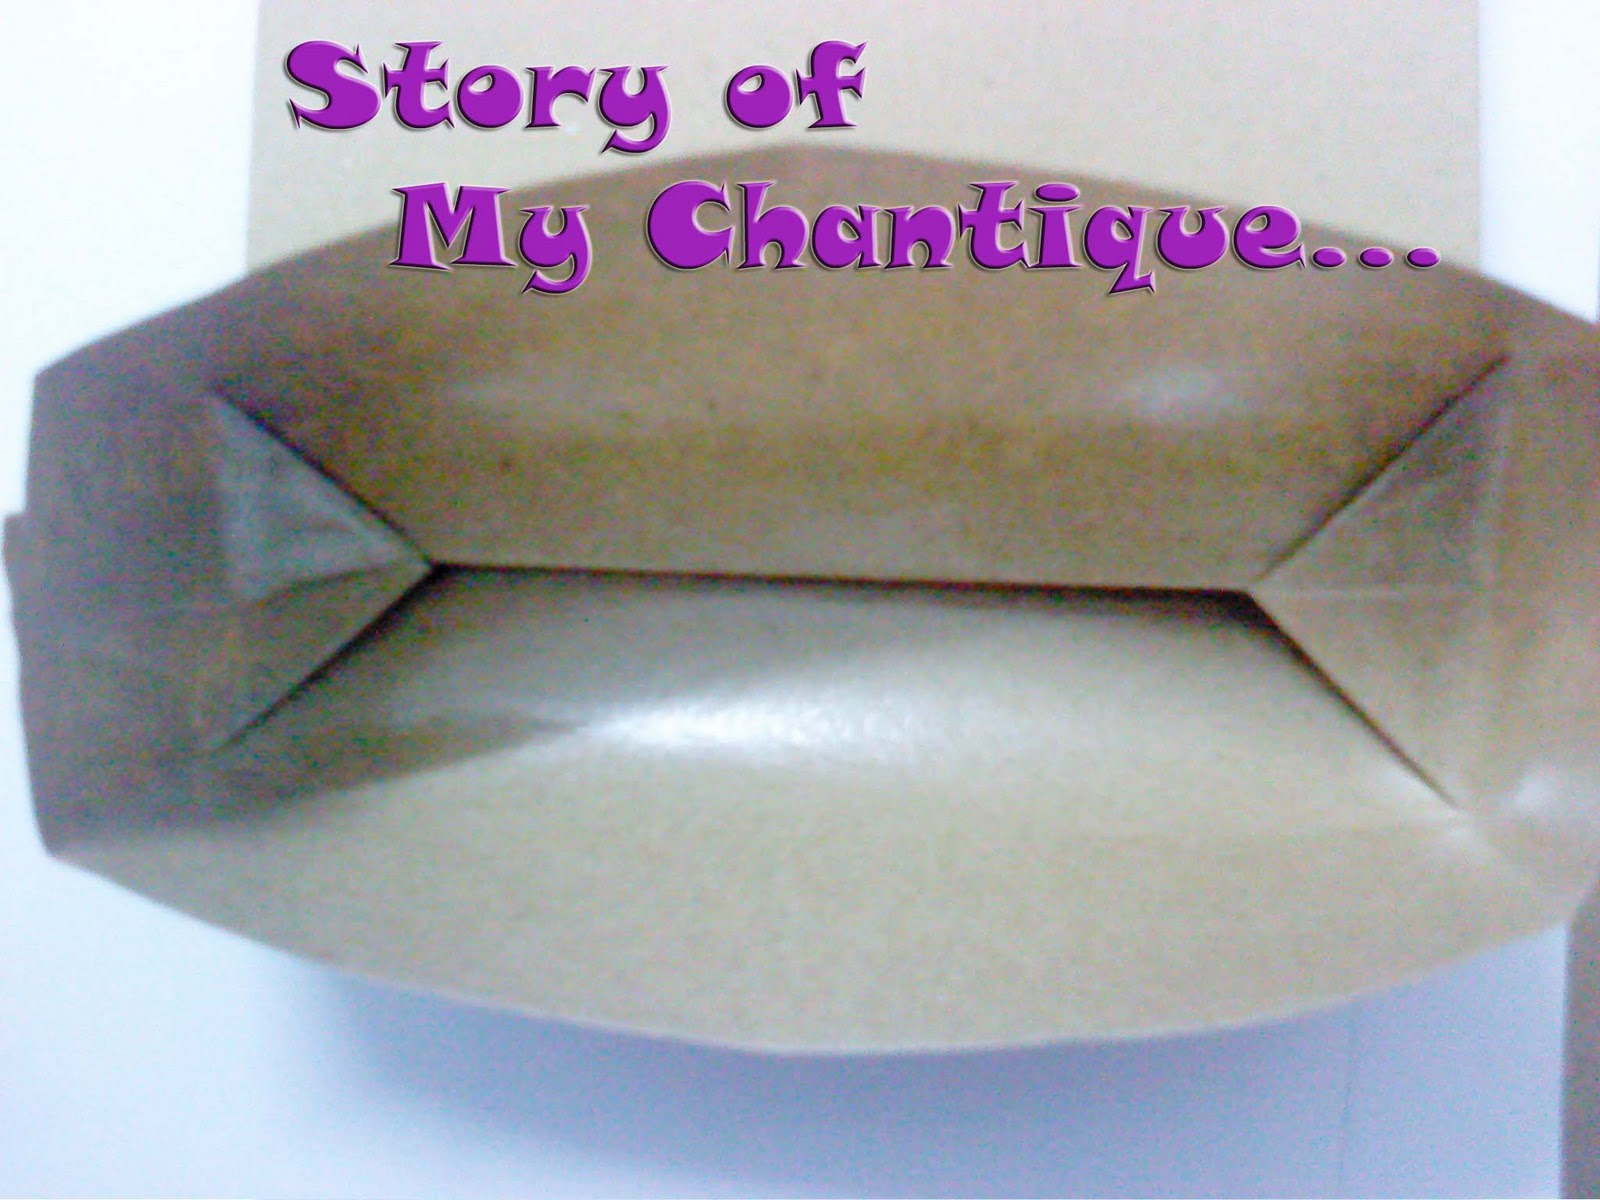 http://2.bp.blogspot.com/-guYC6QhF544/Tn7ValMzTEI/AAAAAAAAAMY/-mE6lDSclds/s1600/11+copy.jpg